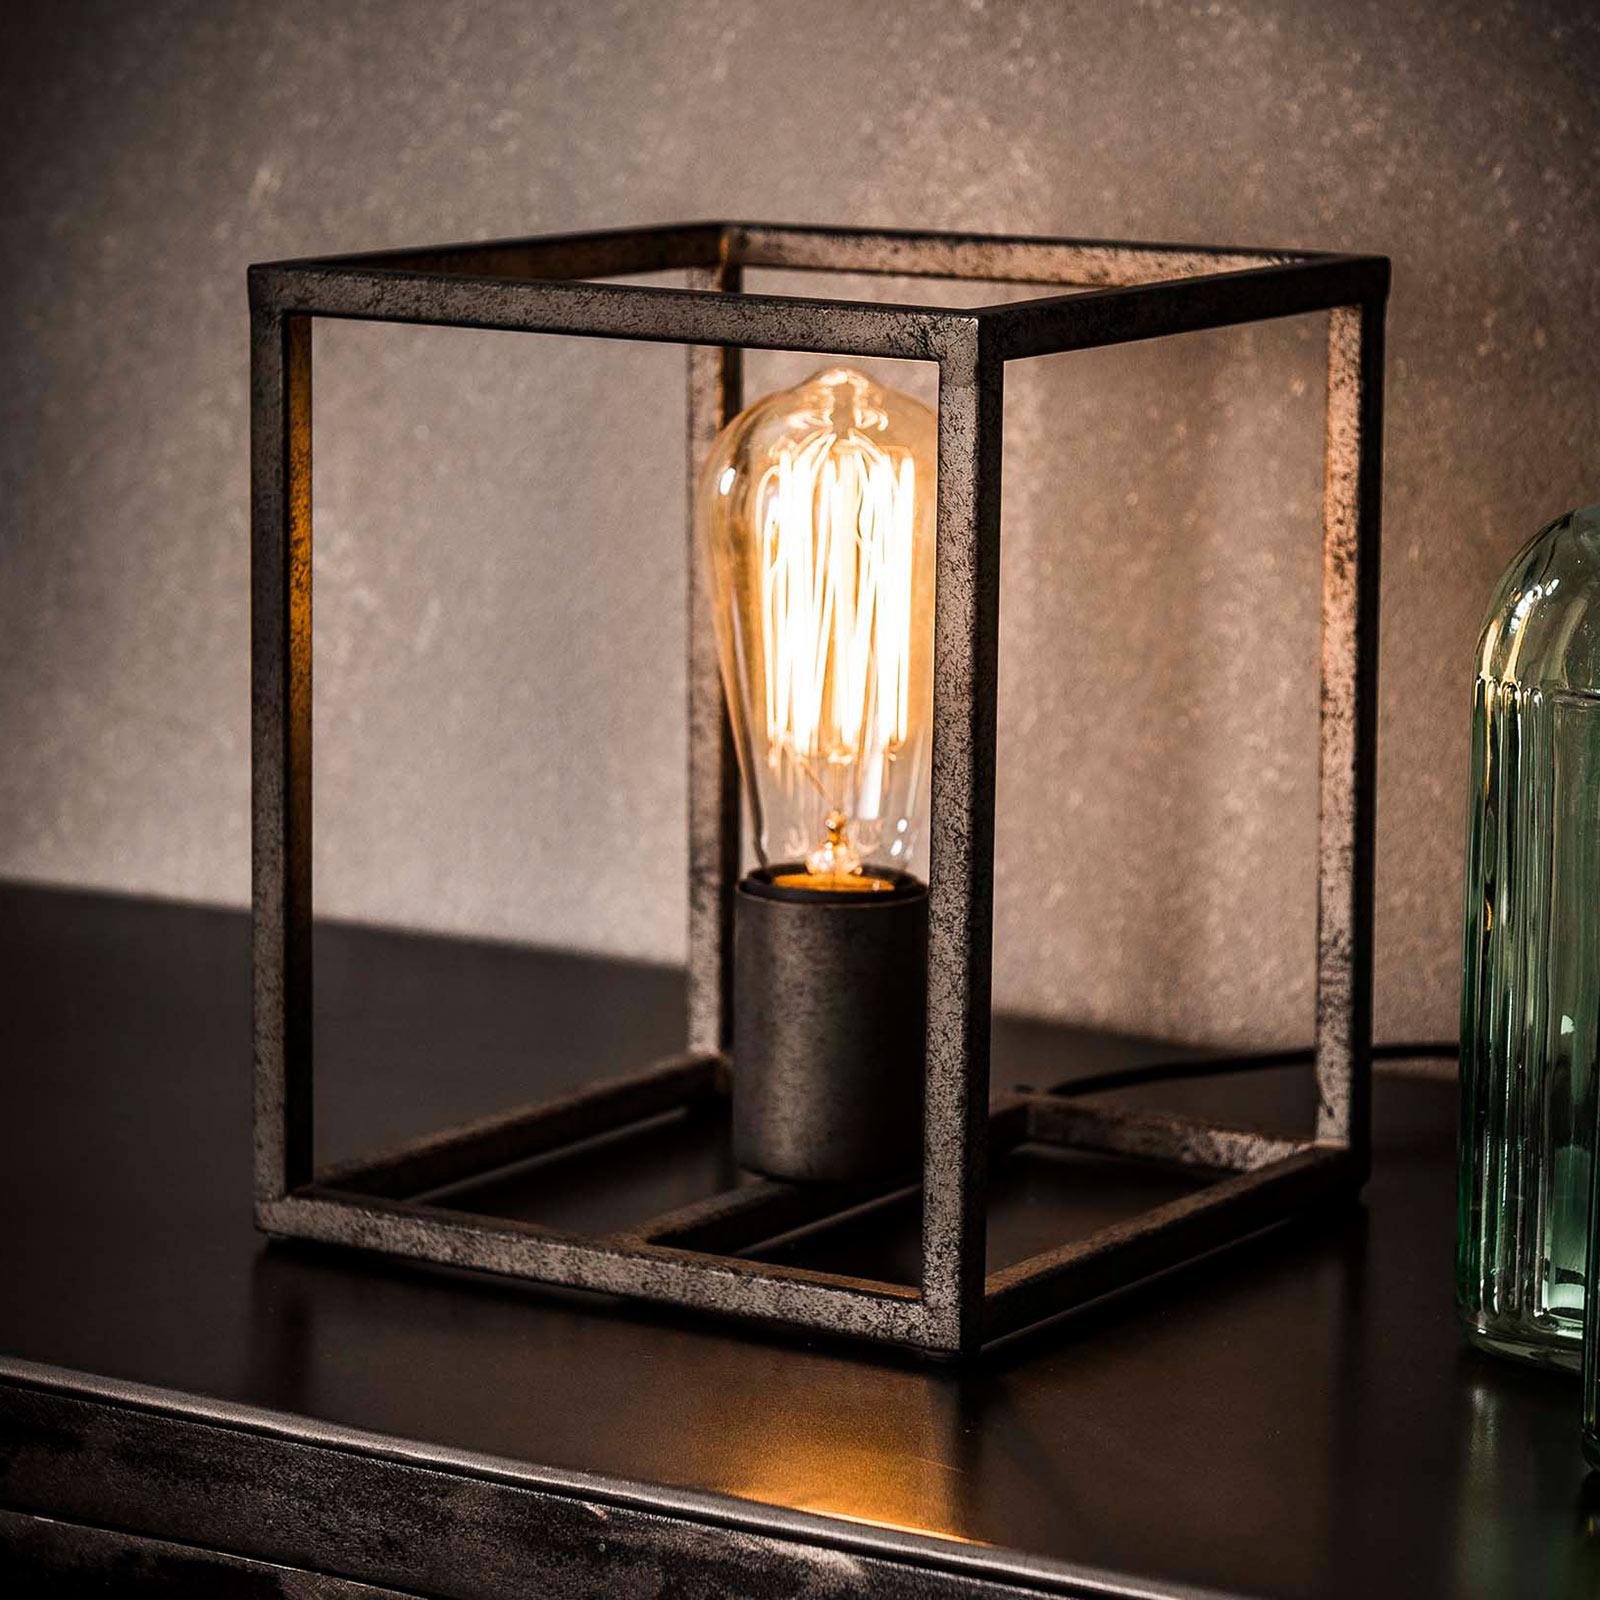 Lámpara de mesa Perpendillumina en forma de cubo